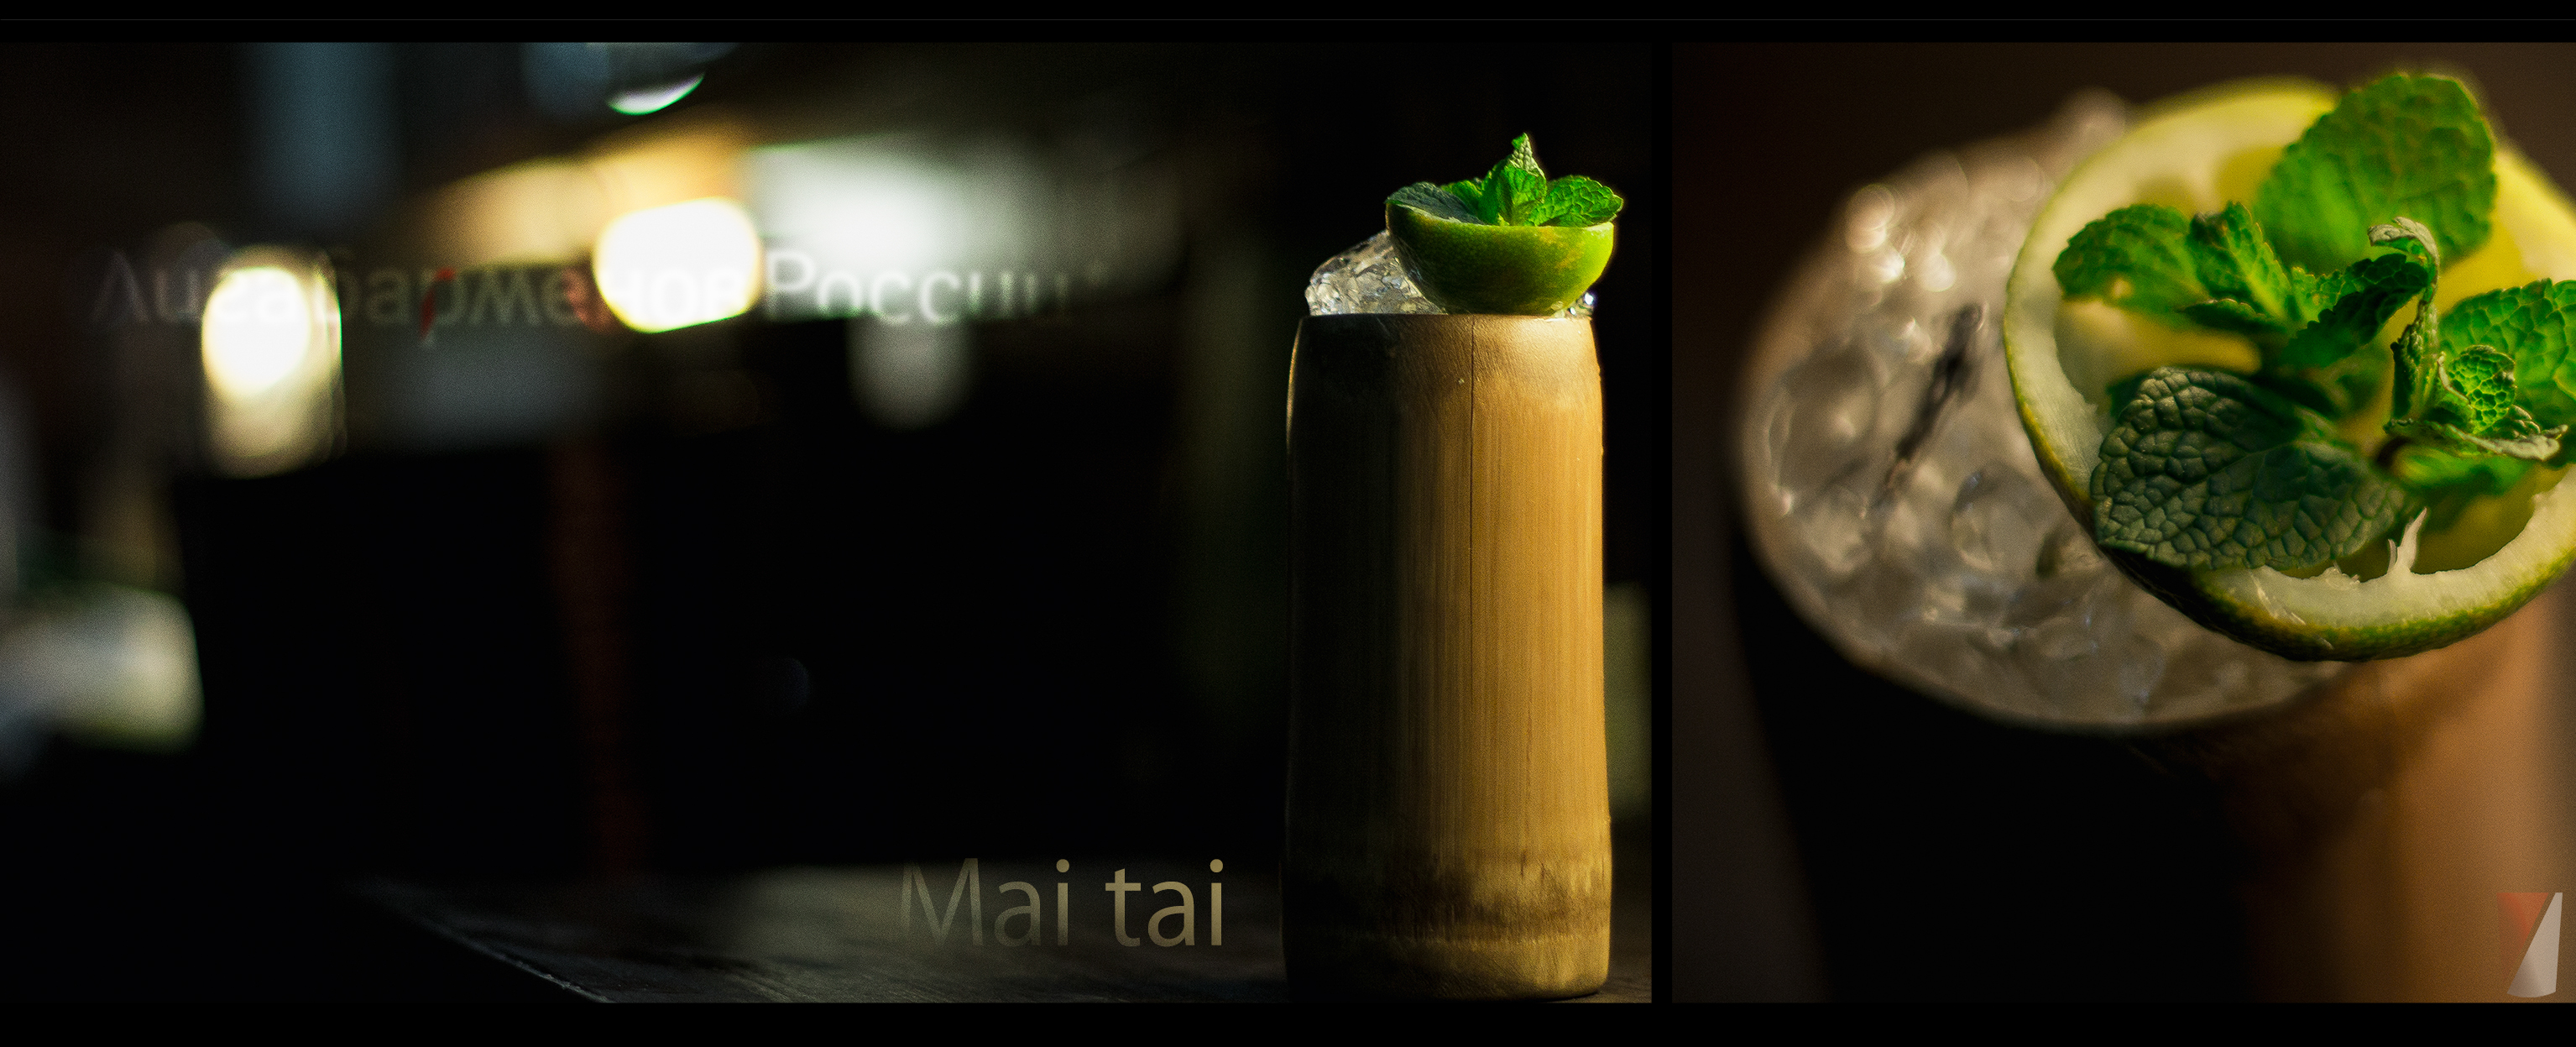 Рецепт коктейля Mai-tai